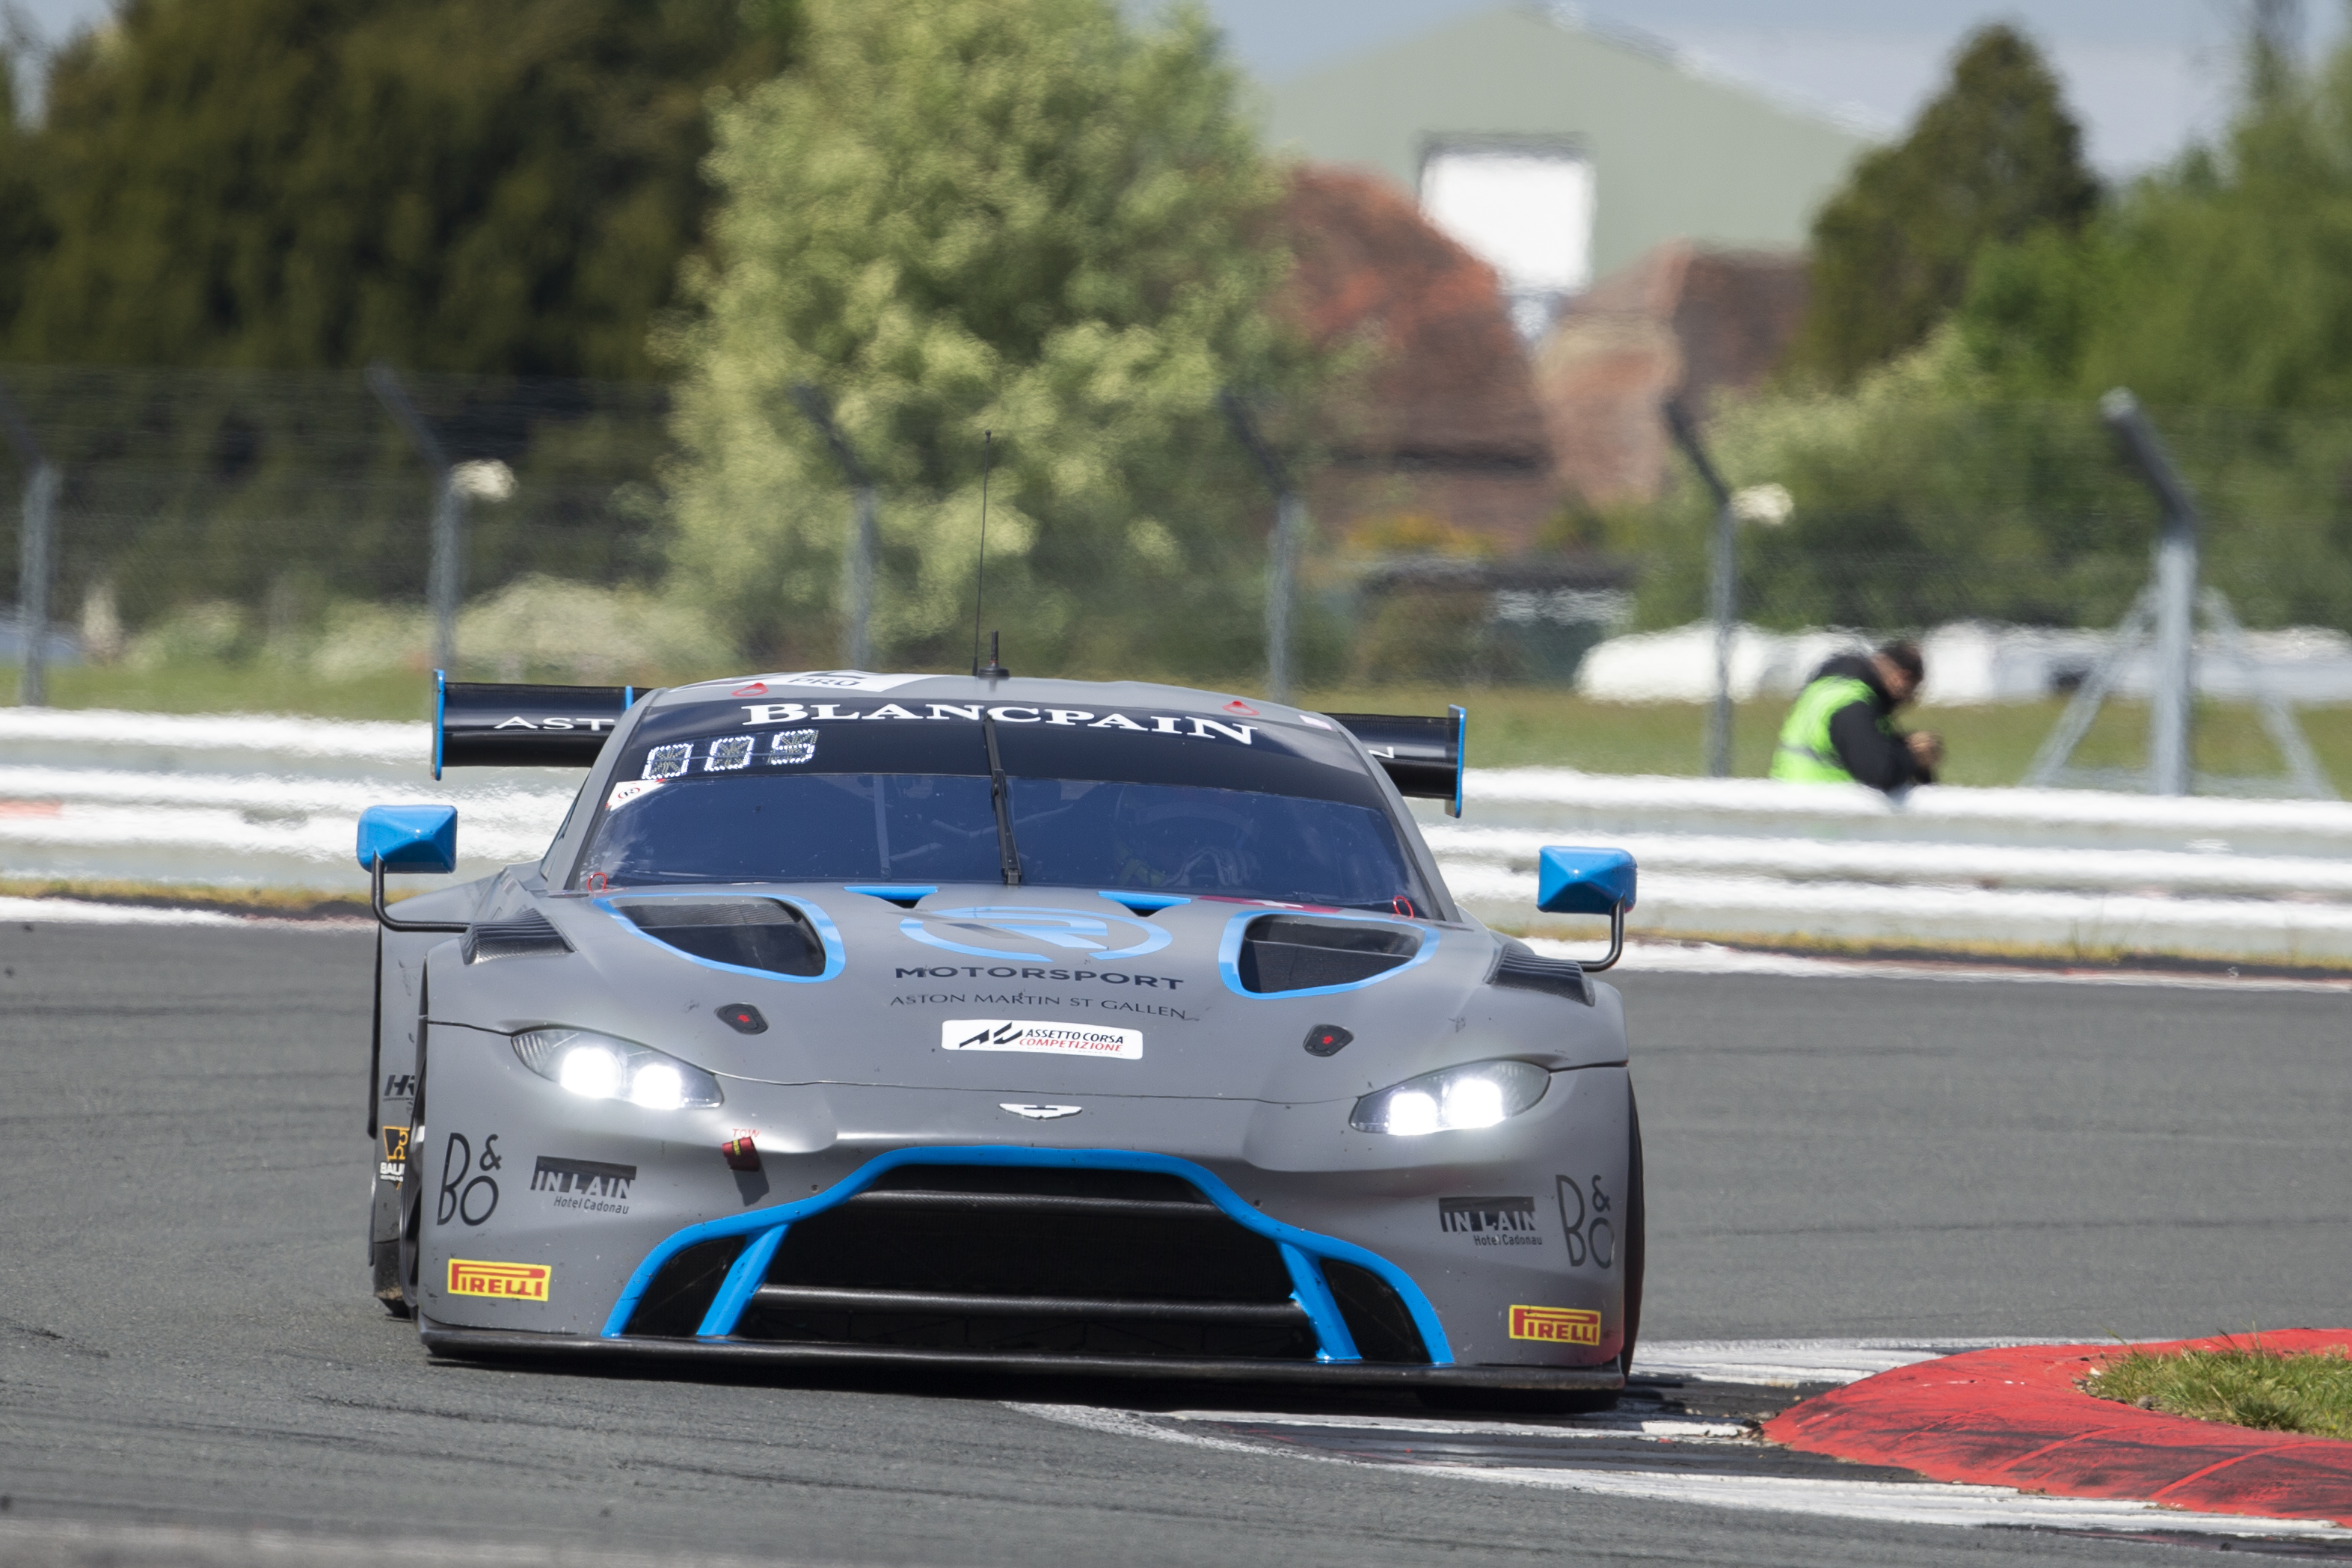 R Motorsport S Strong Performance Goes Unrewarded At Silverstone Endurance Info English Spoken